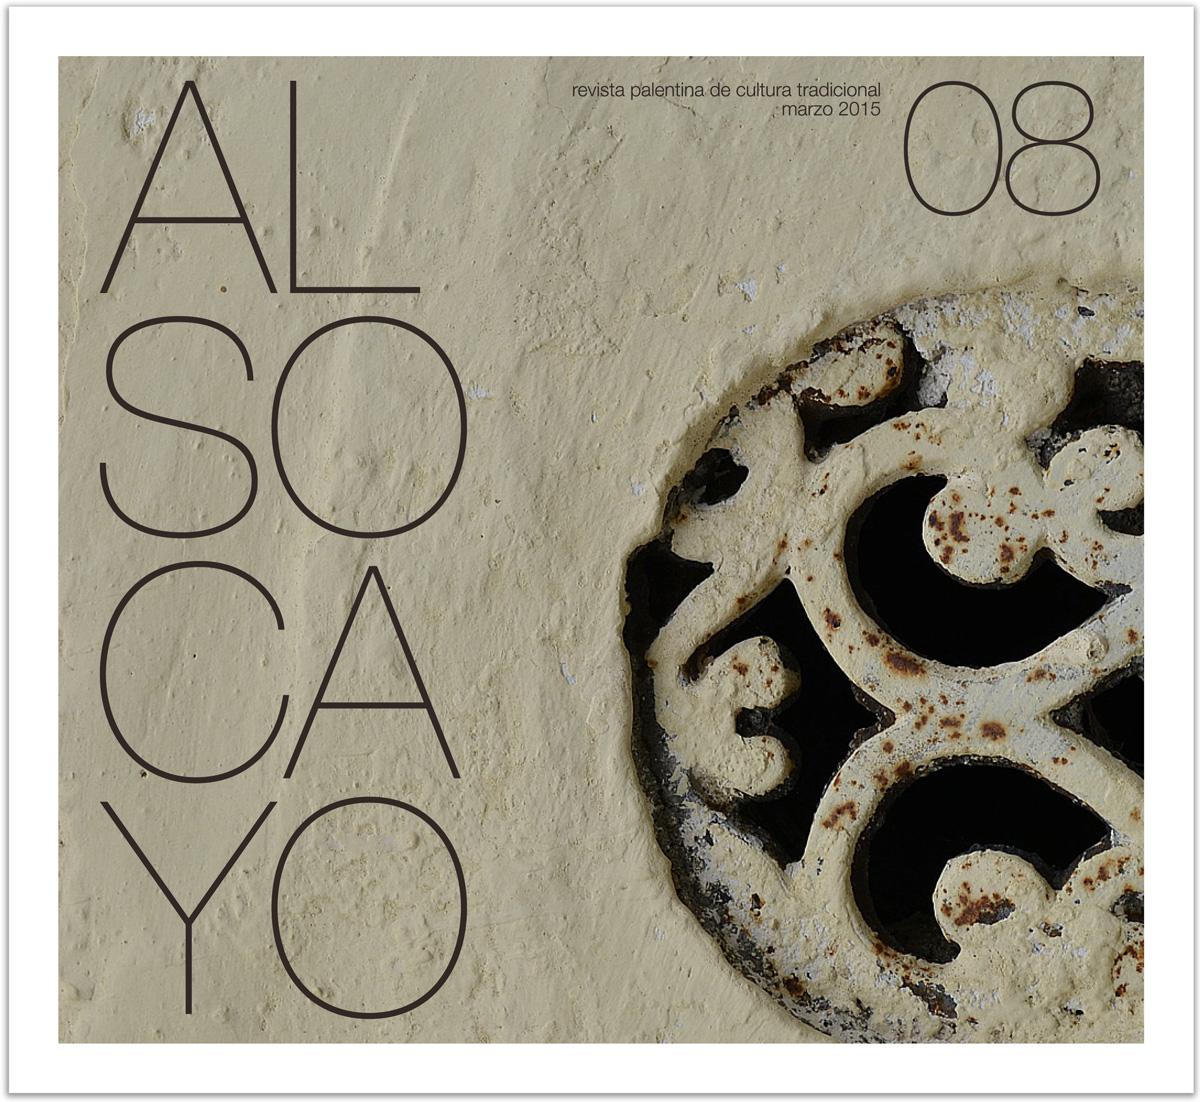 AL SOCAYO 08 B